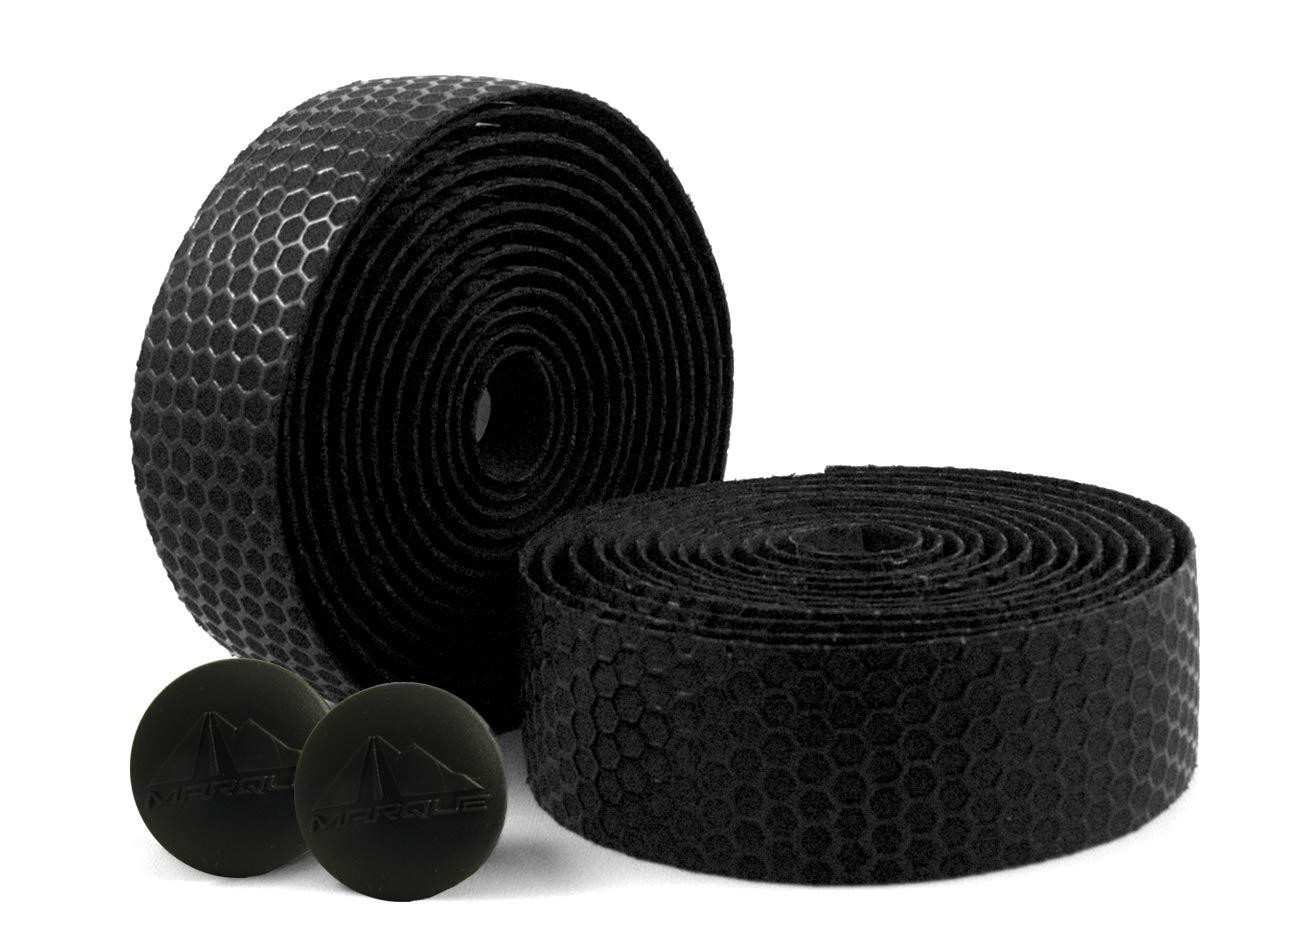 MARQUE Hex Grip Bar Tape - Road Bike Handlebar Tape 2PCS per Set (Black) by MARQUE